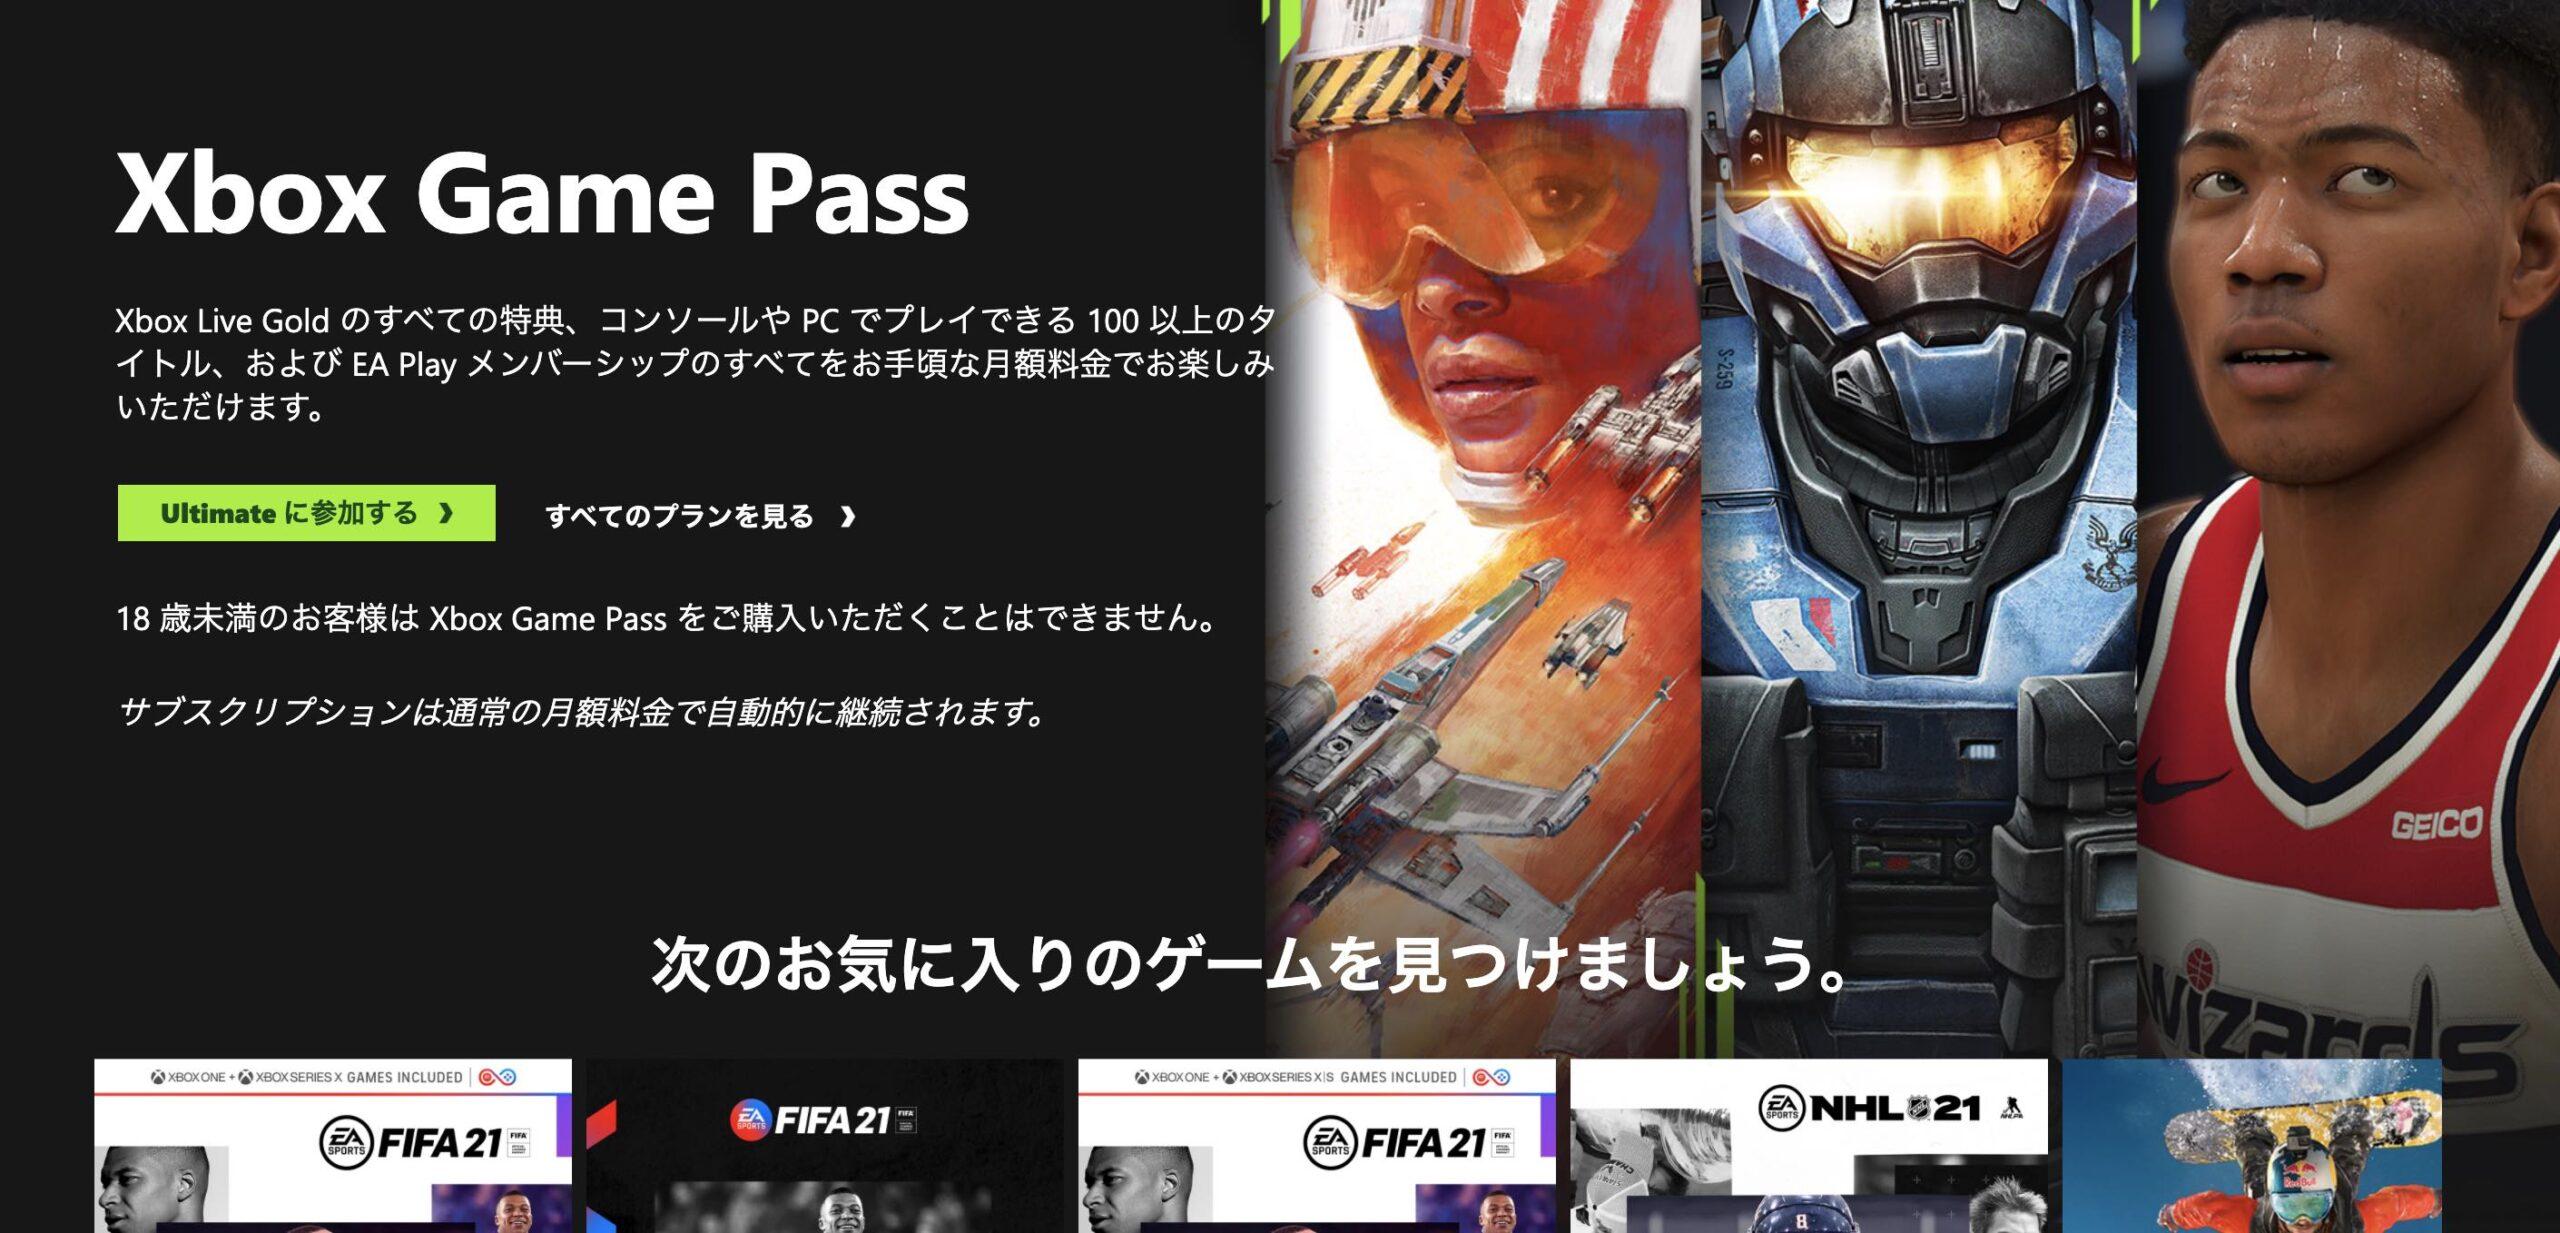 Xbox Game Pass とは